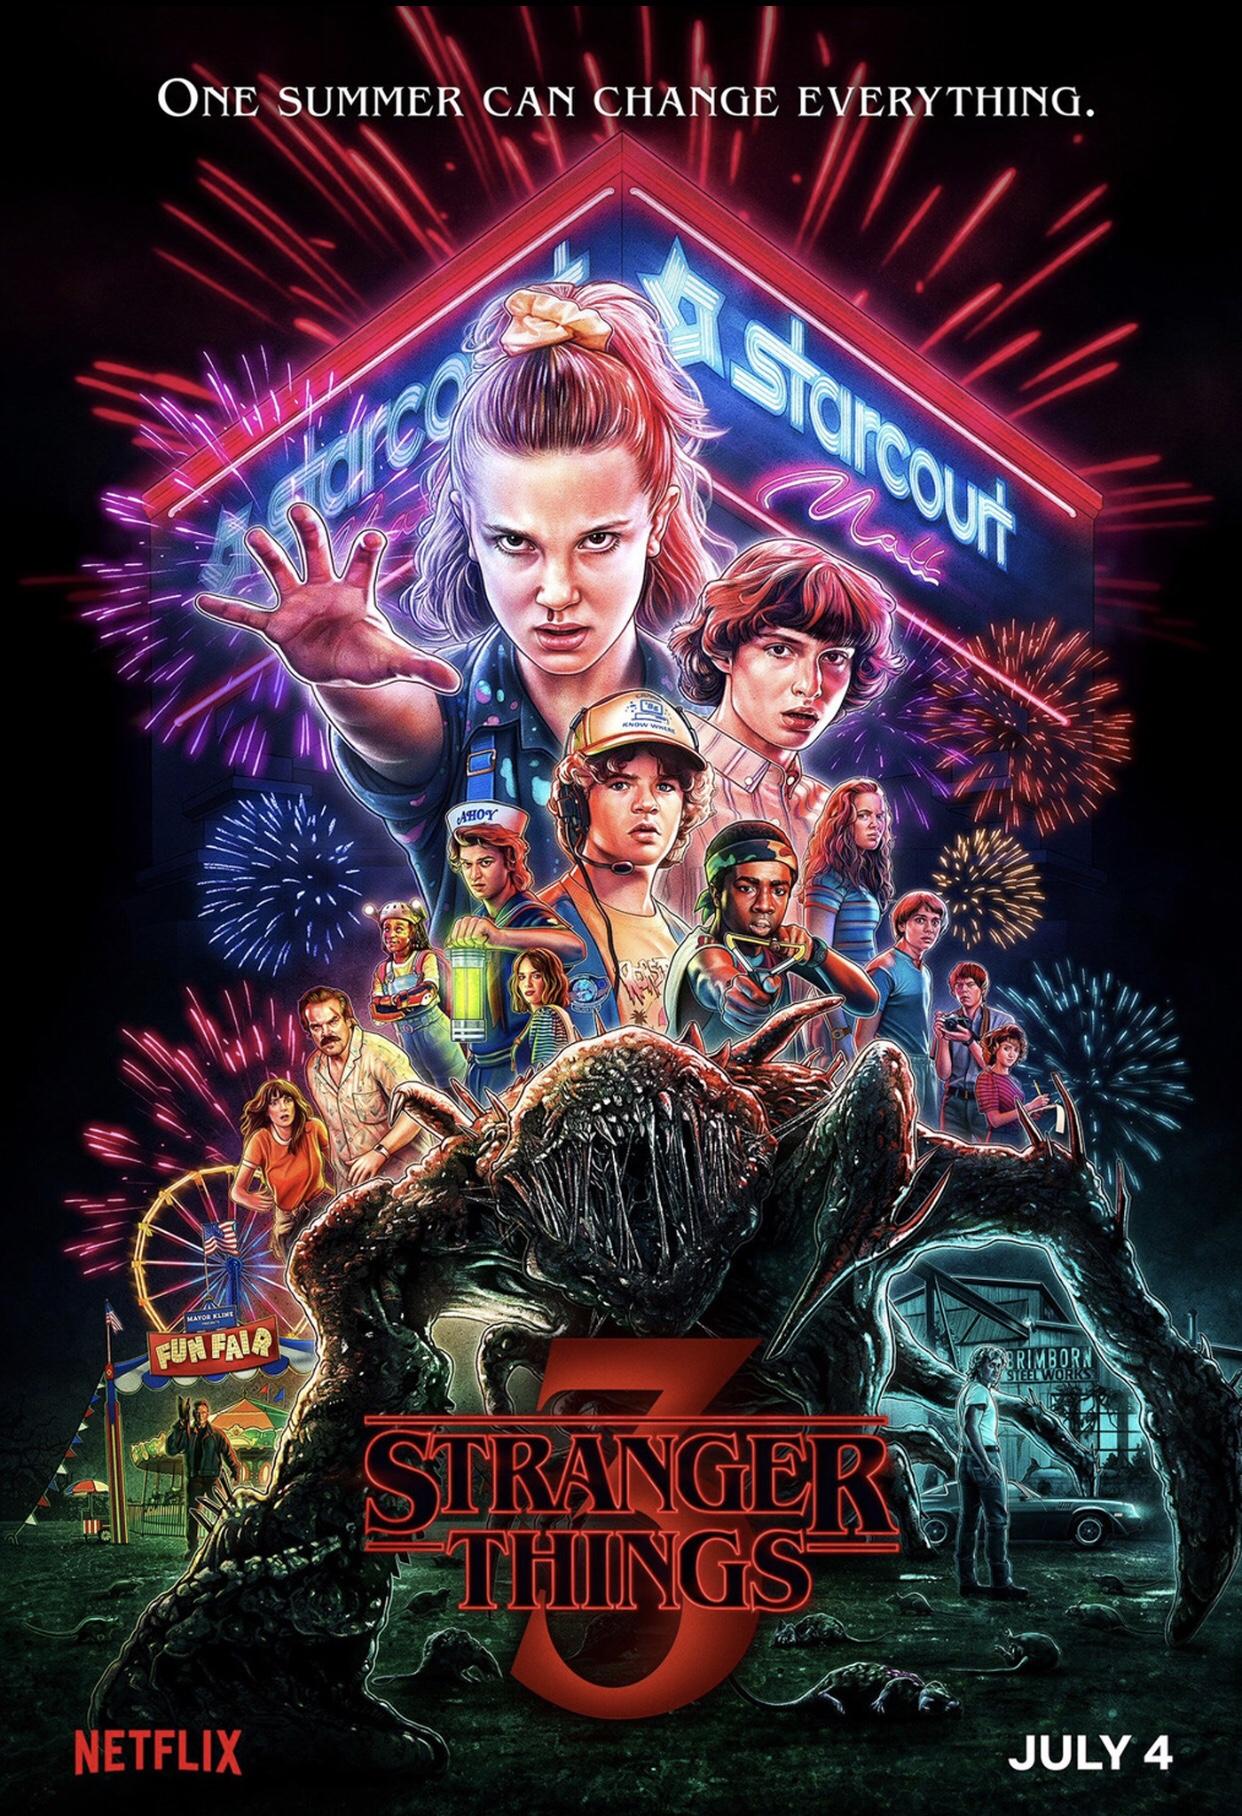 Stranger Things Season 3 Poster by Kyle Lambert